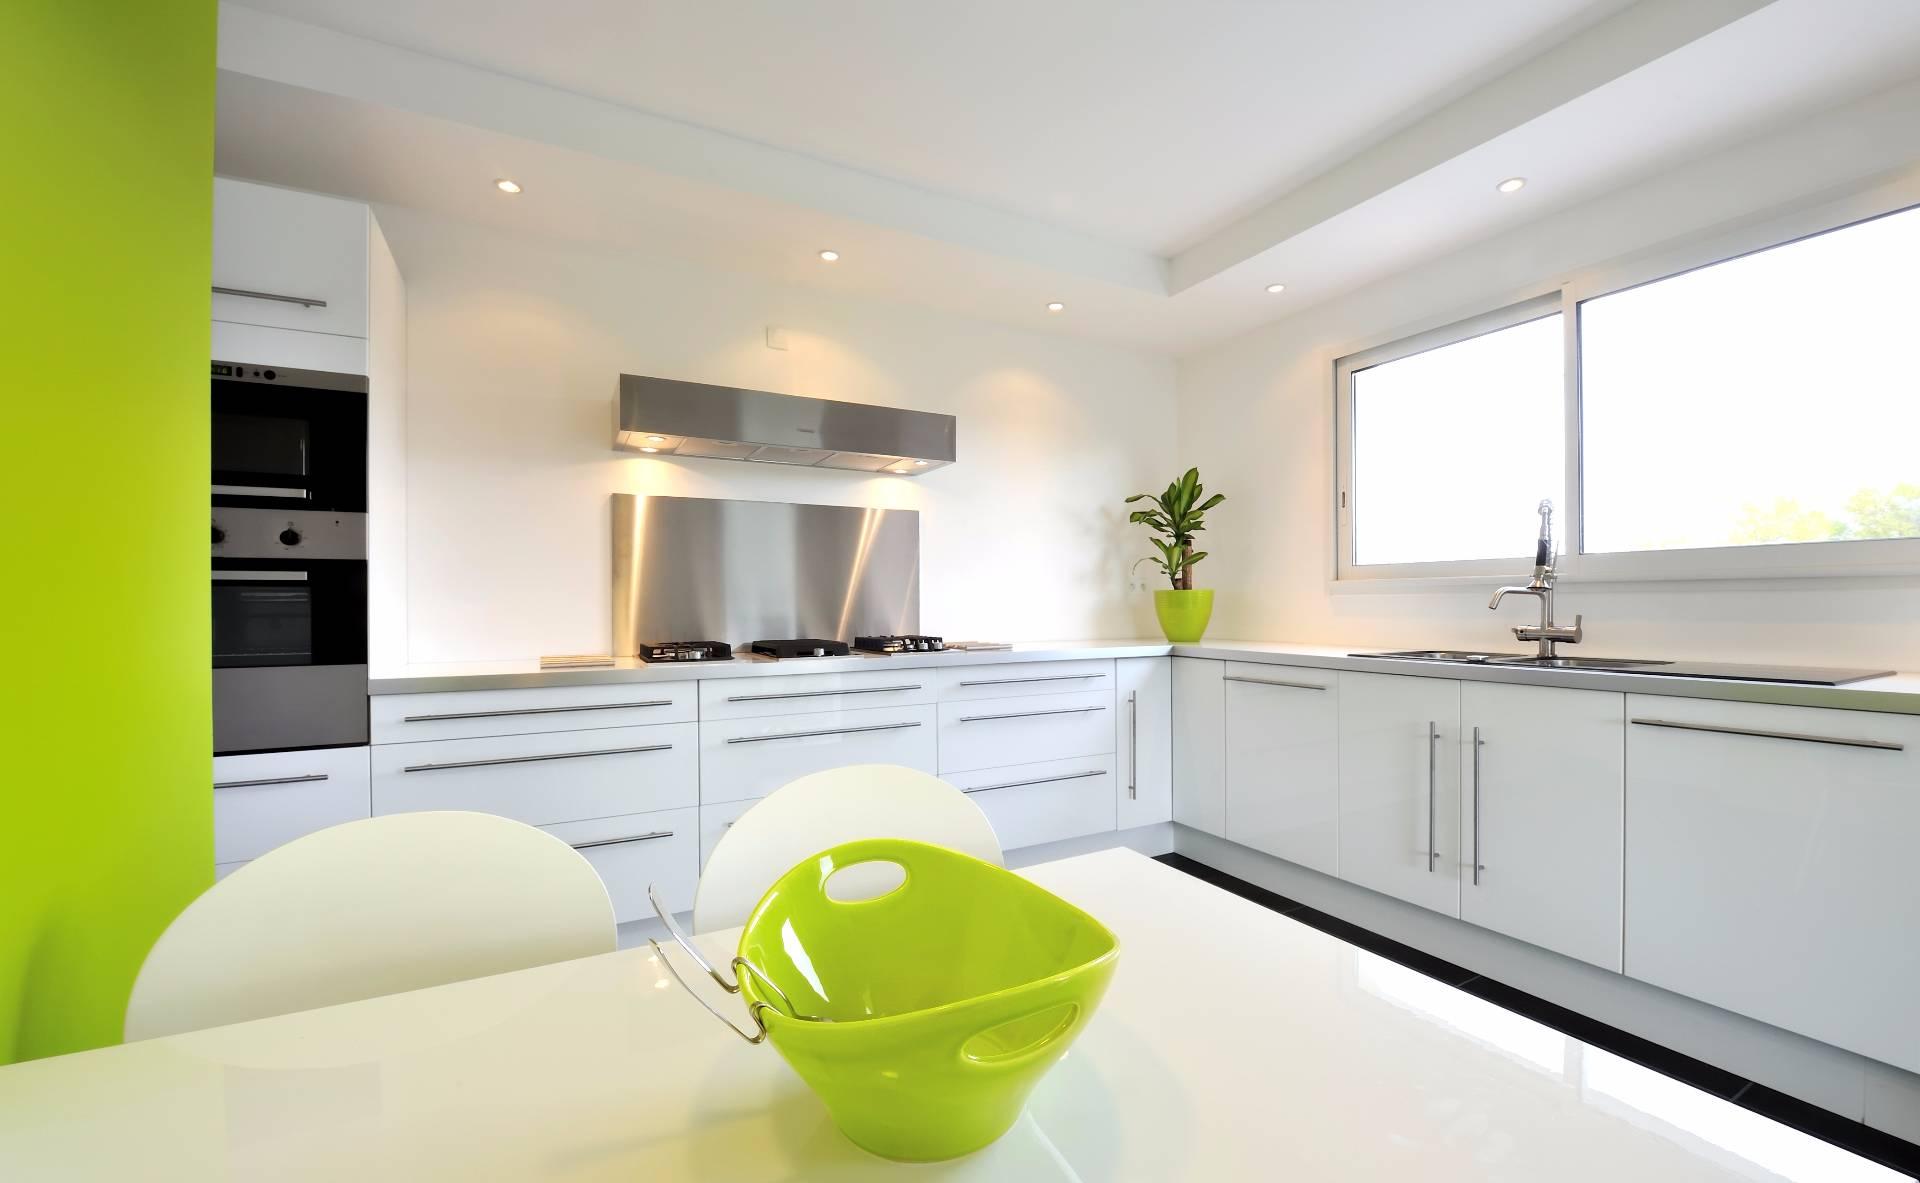 Diseño e instalación de cocinas a medida